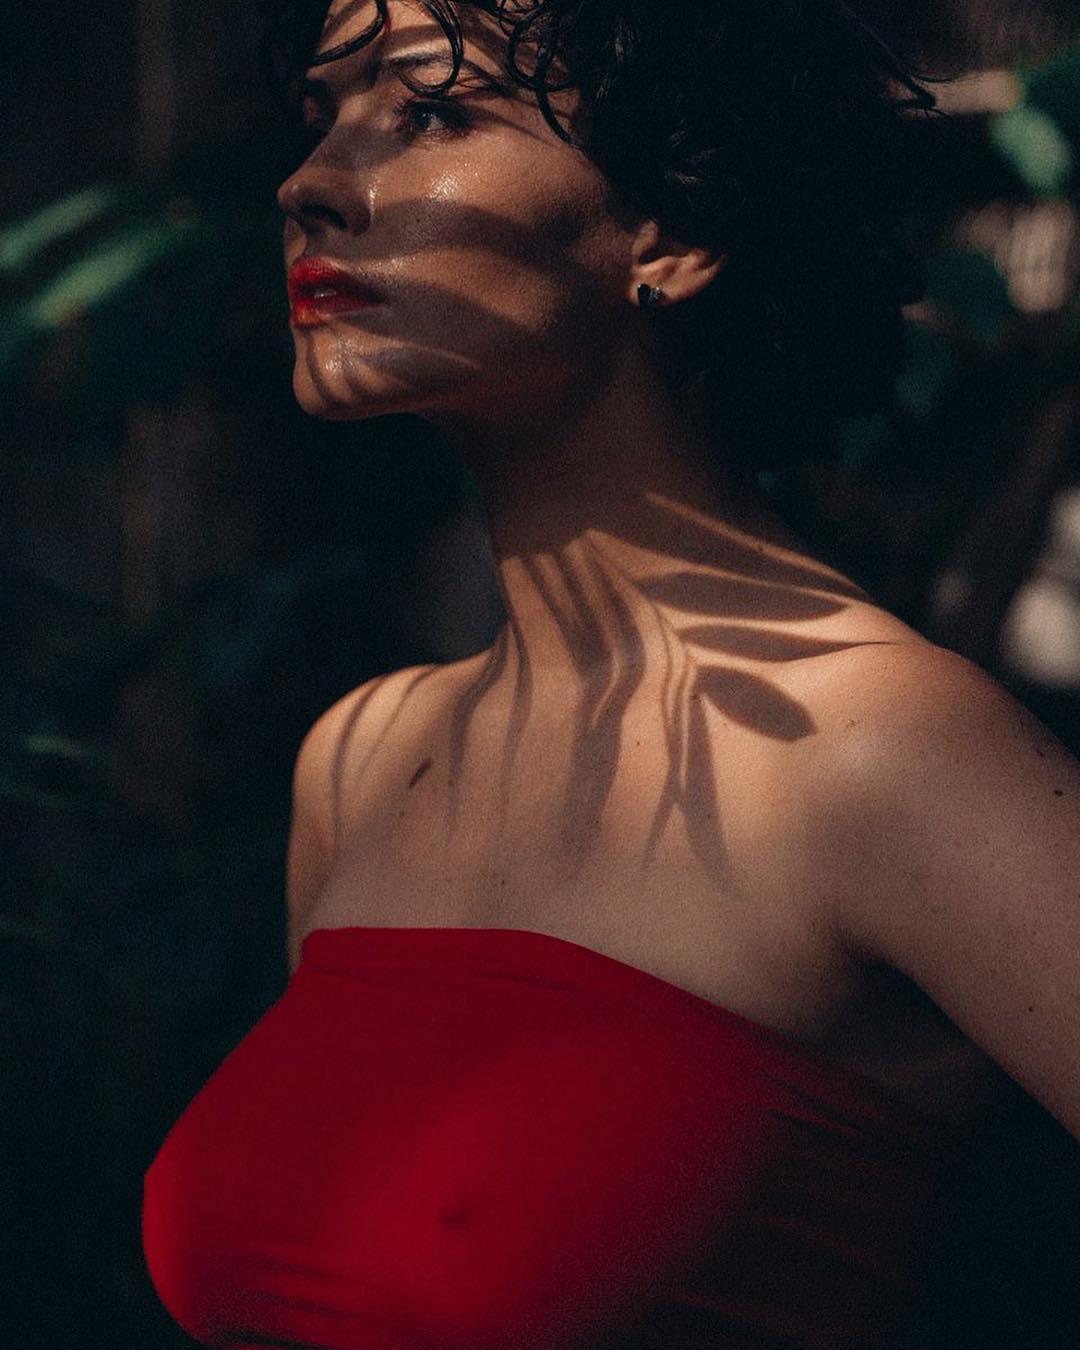 Даша Астафьева: #photo by @martasyrko #mua @ivannamamchuk @wolford